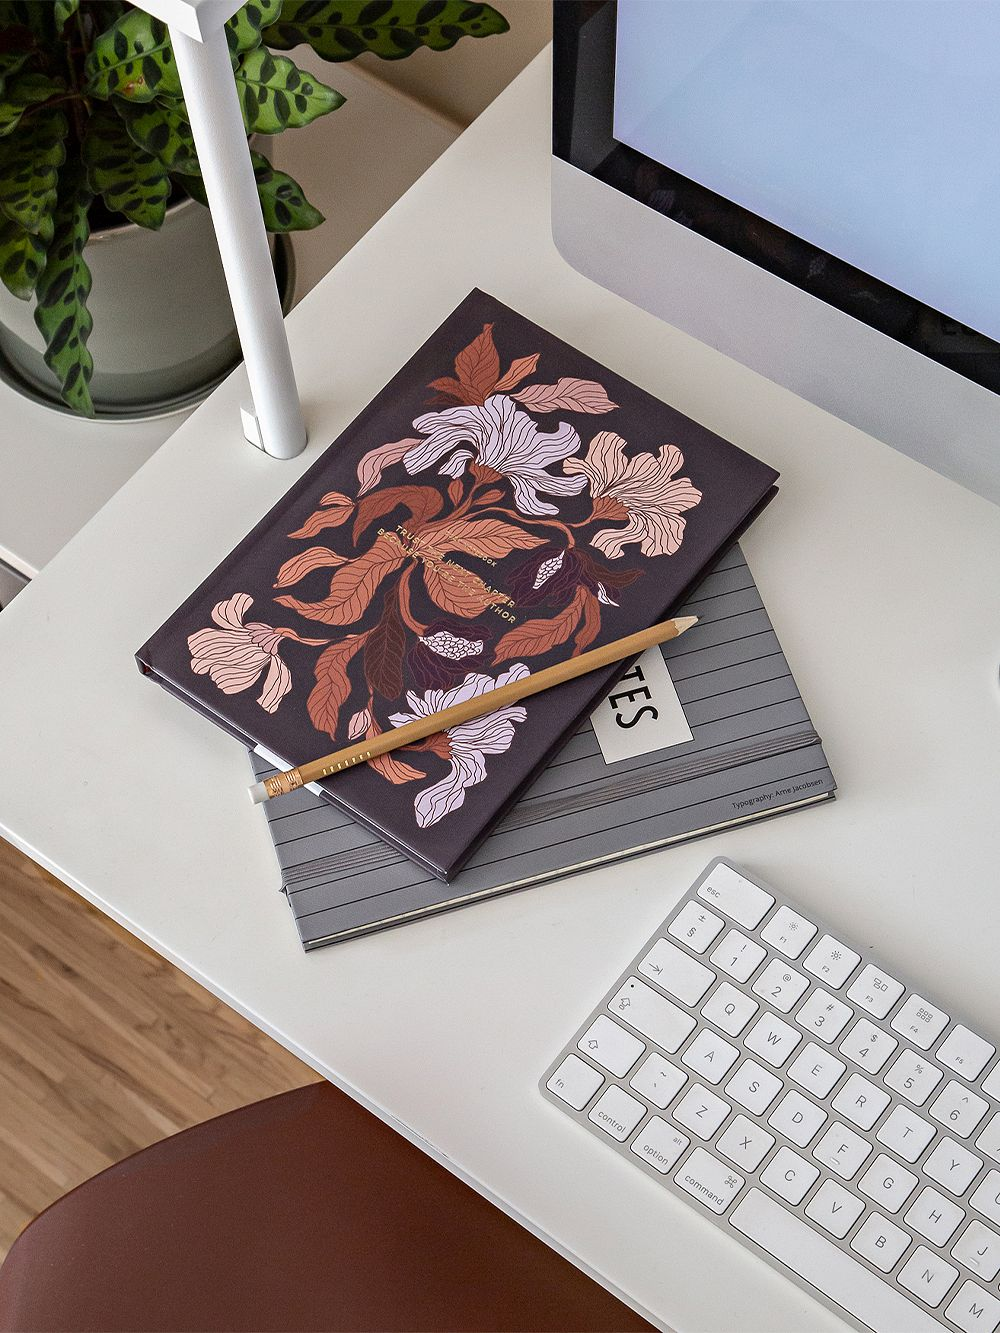 Cozy Publishing Cozy Flower notebook, peach blossom